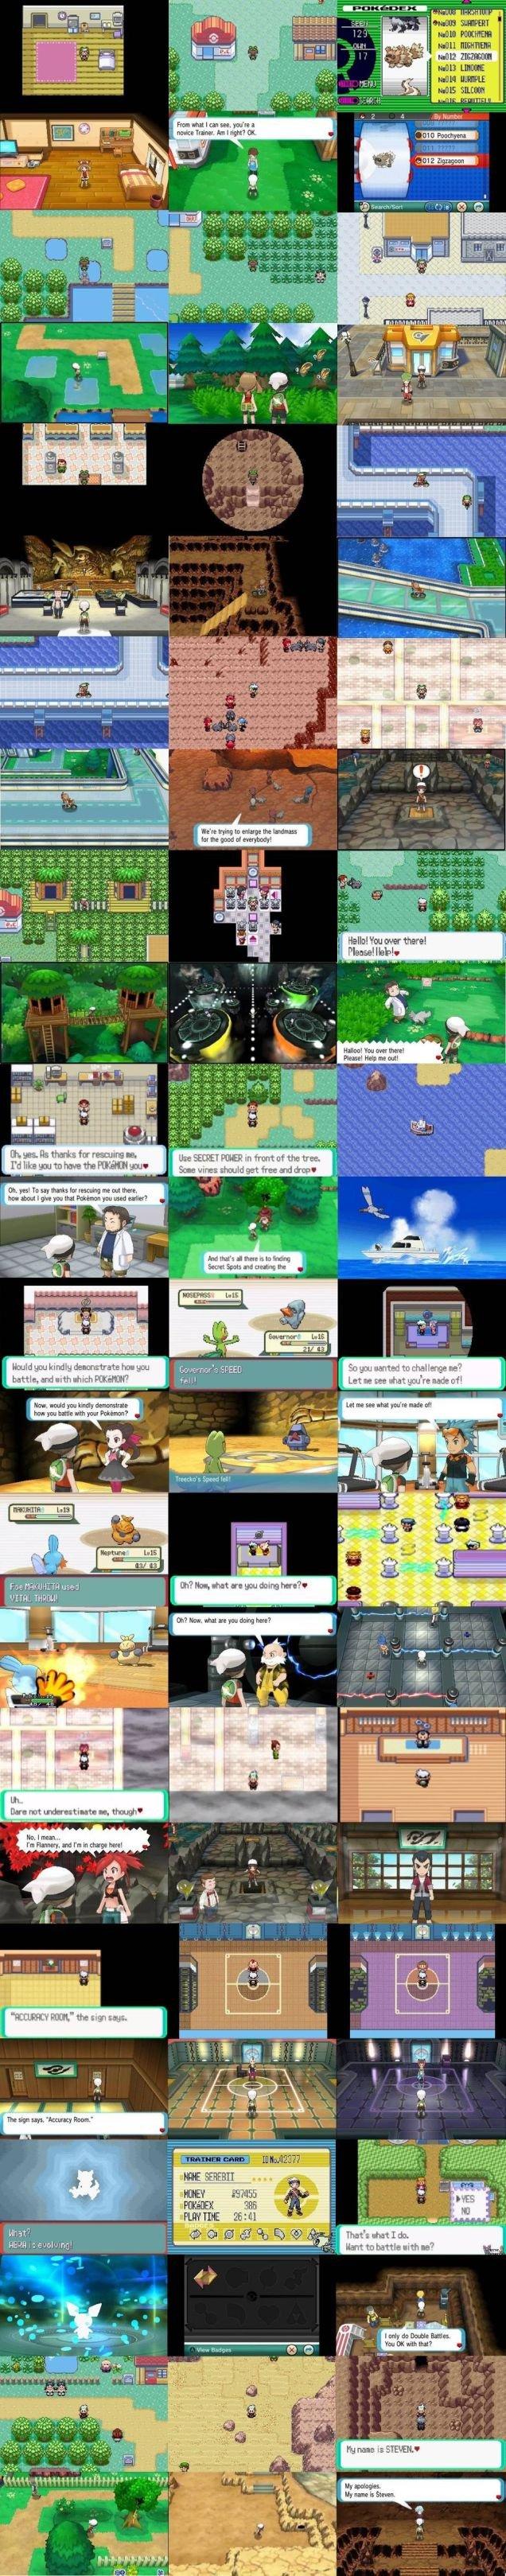 Pokemon Emerald Pokedex Original